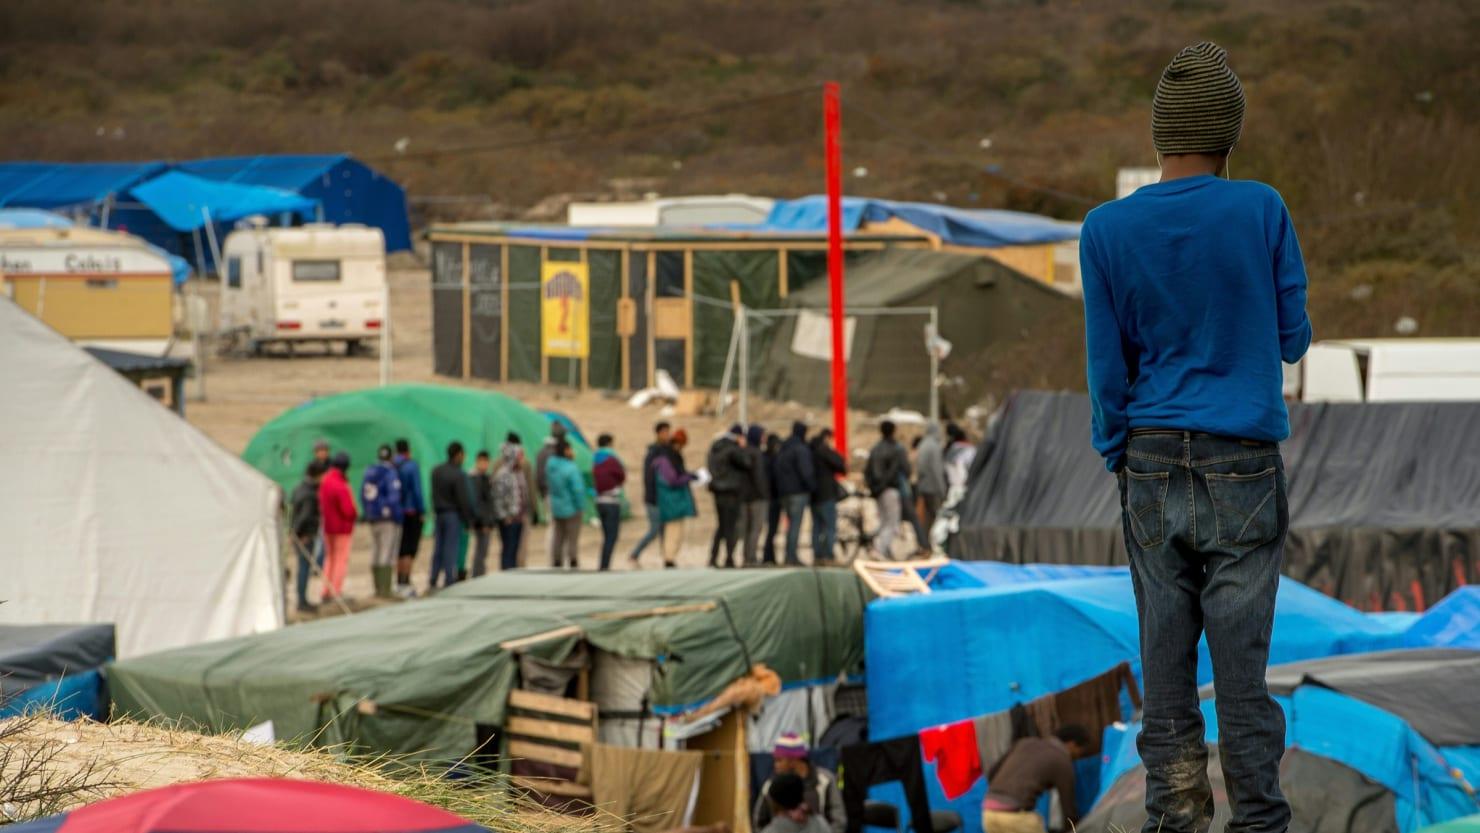 1M+ Refugees Entered Europe in 2015